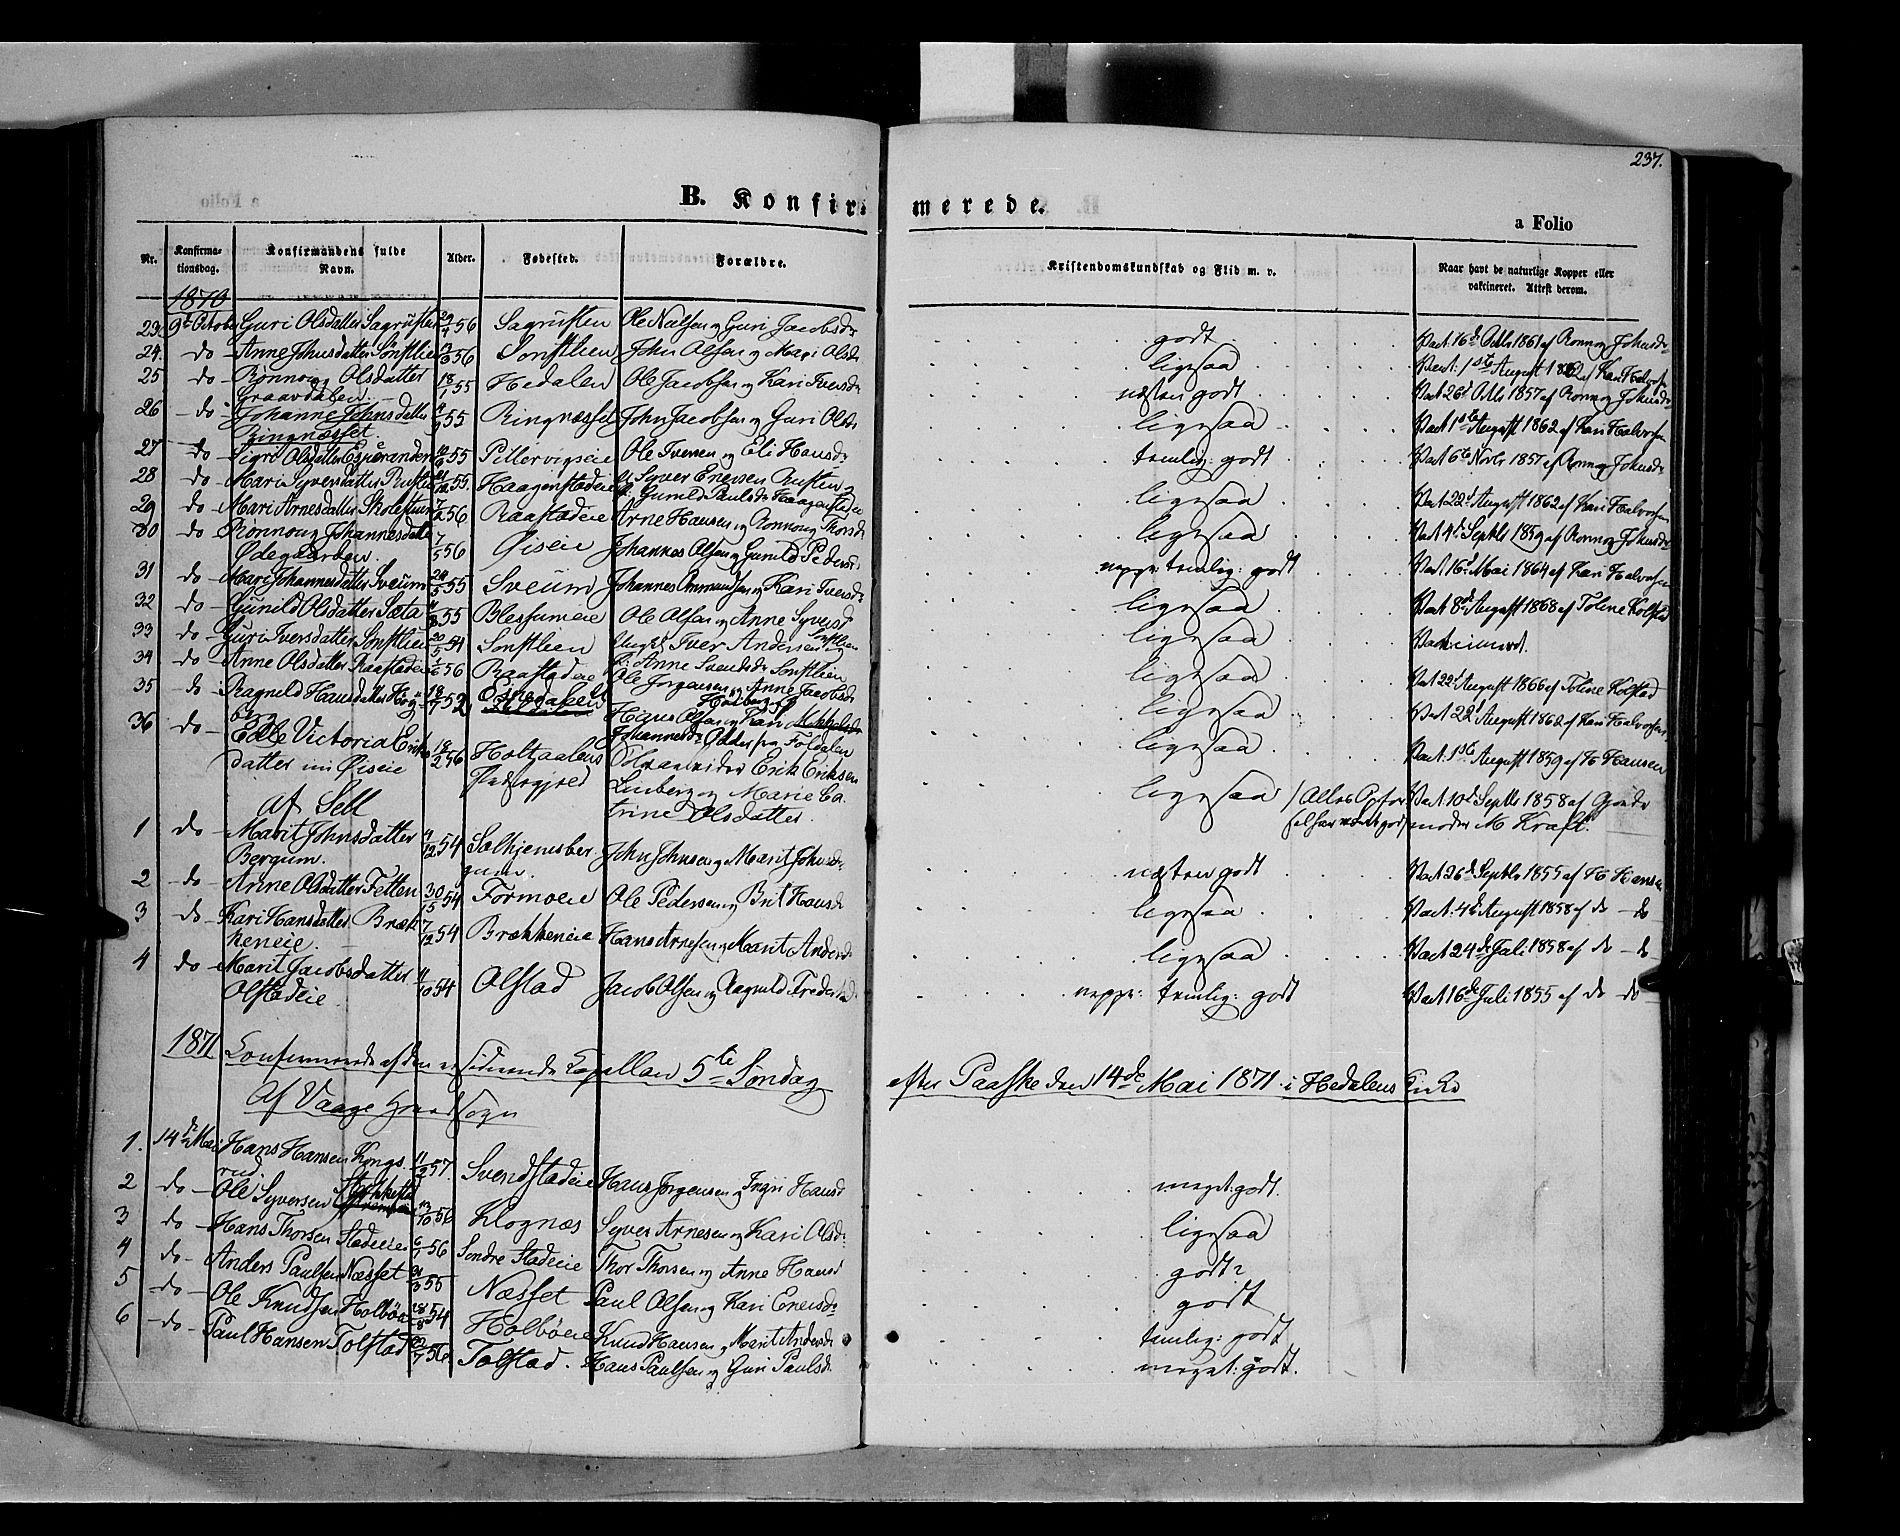 SAH, Vågå prestekontor, Ministerialbok nr. 6 /1, 1856-1872, s. 237